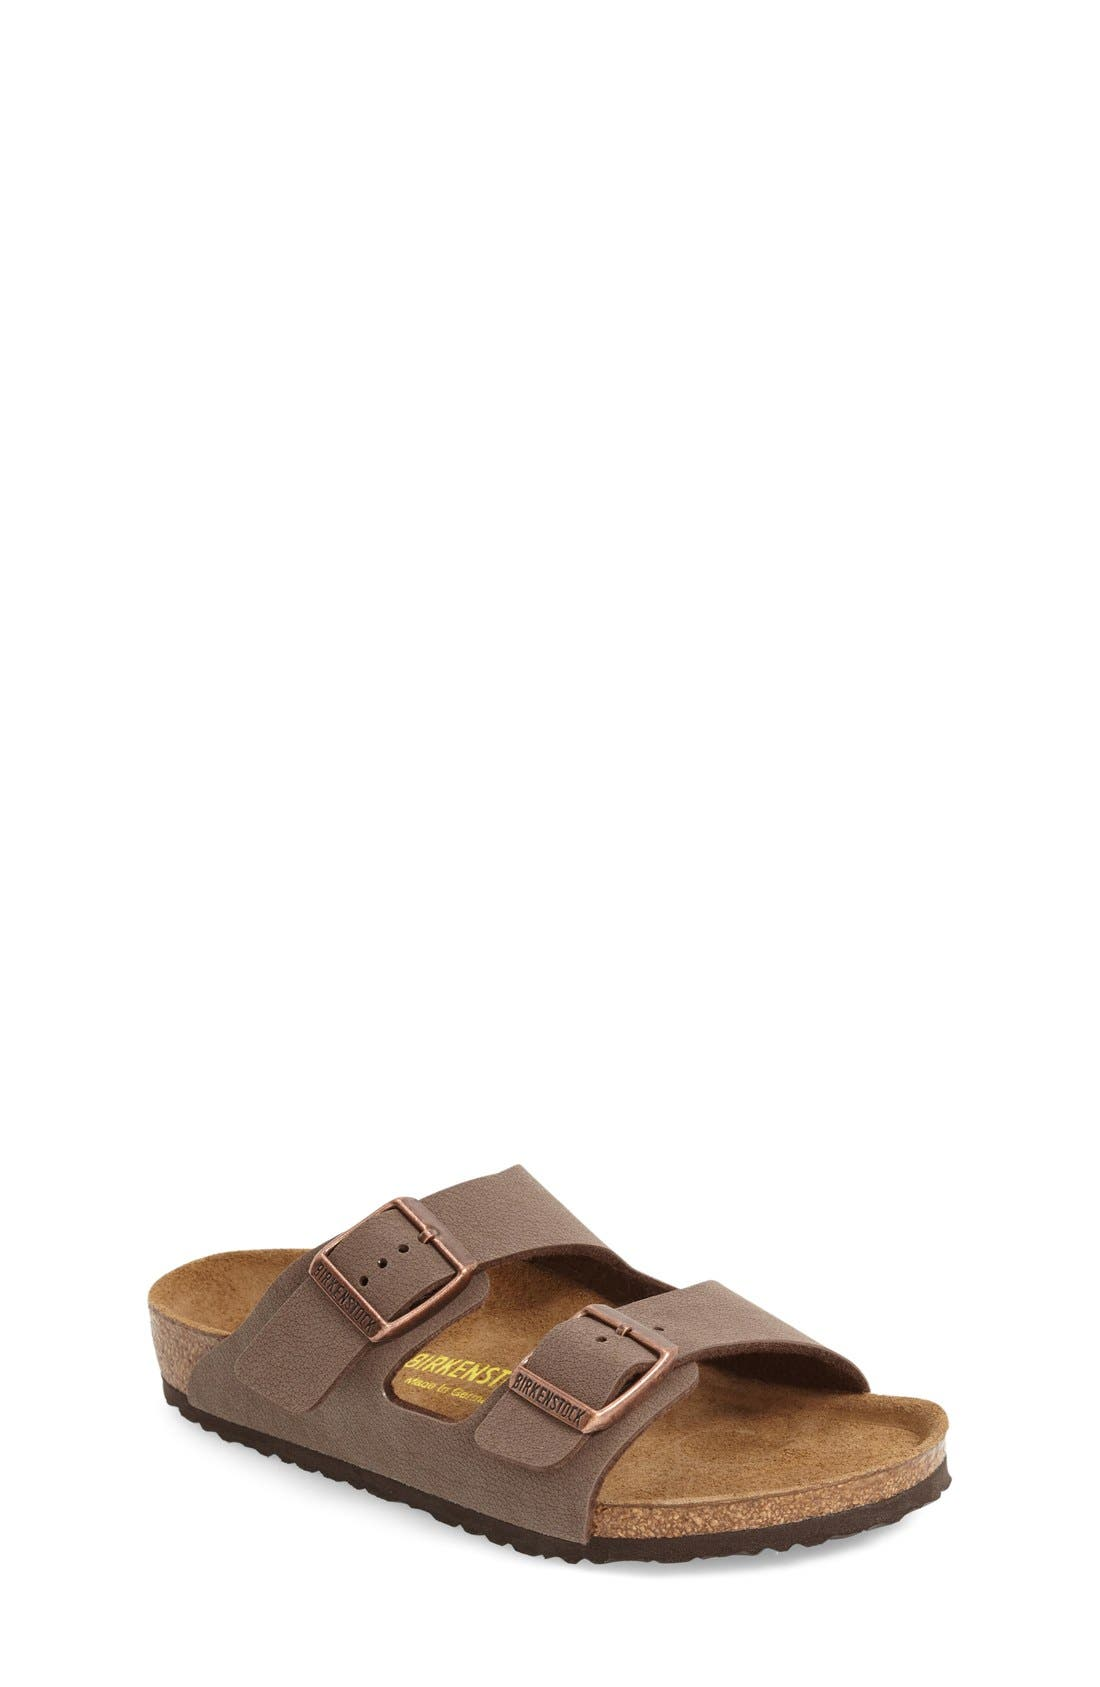 'Arizona' Suede Sandal,                         Main,                         color, Mocha